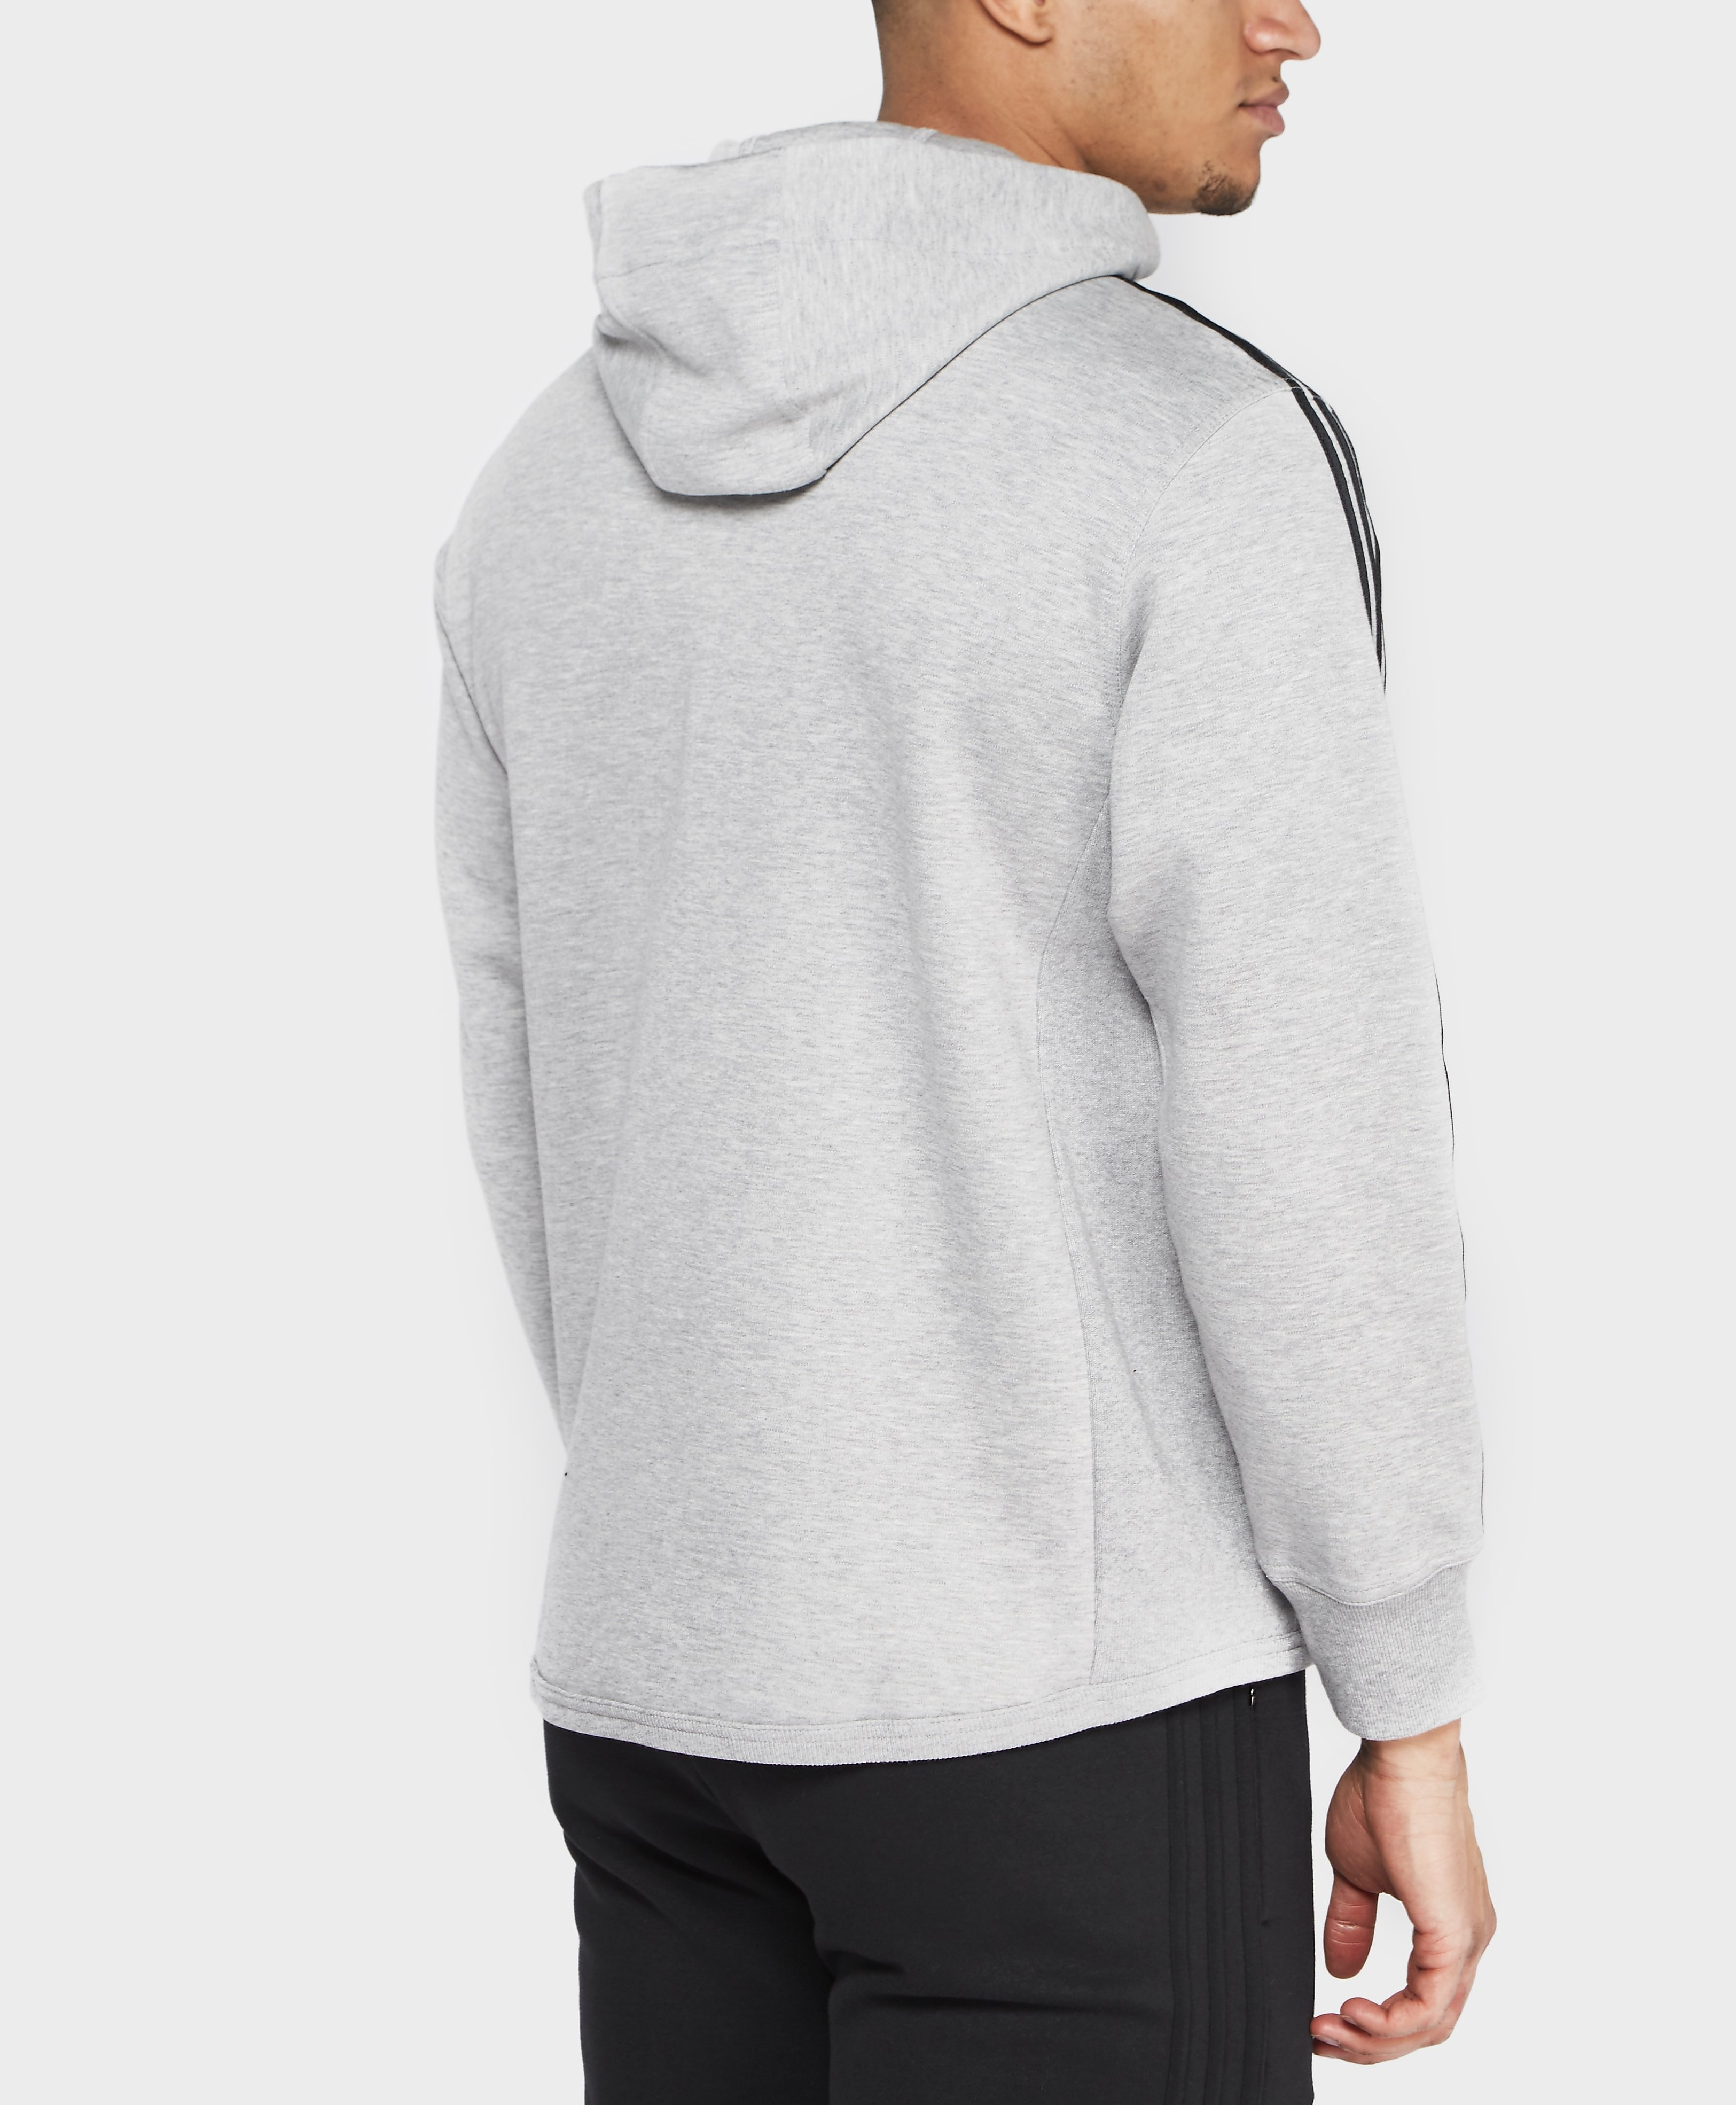 adidas Originals ADC Half Zip Hoody